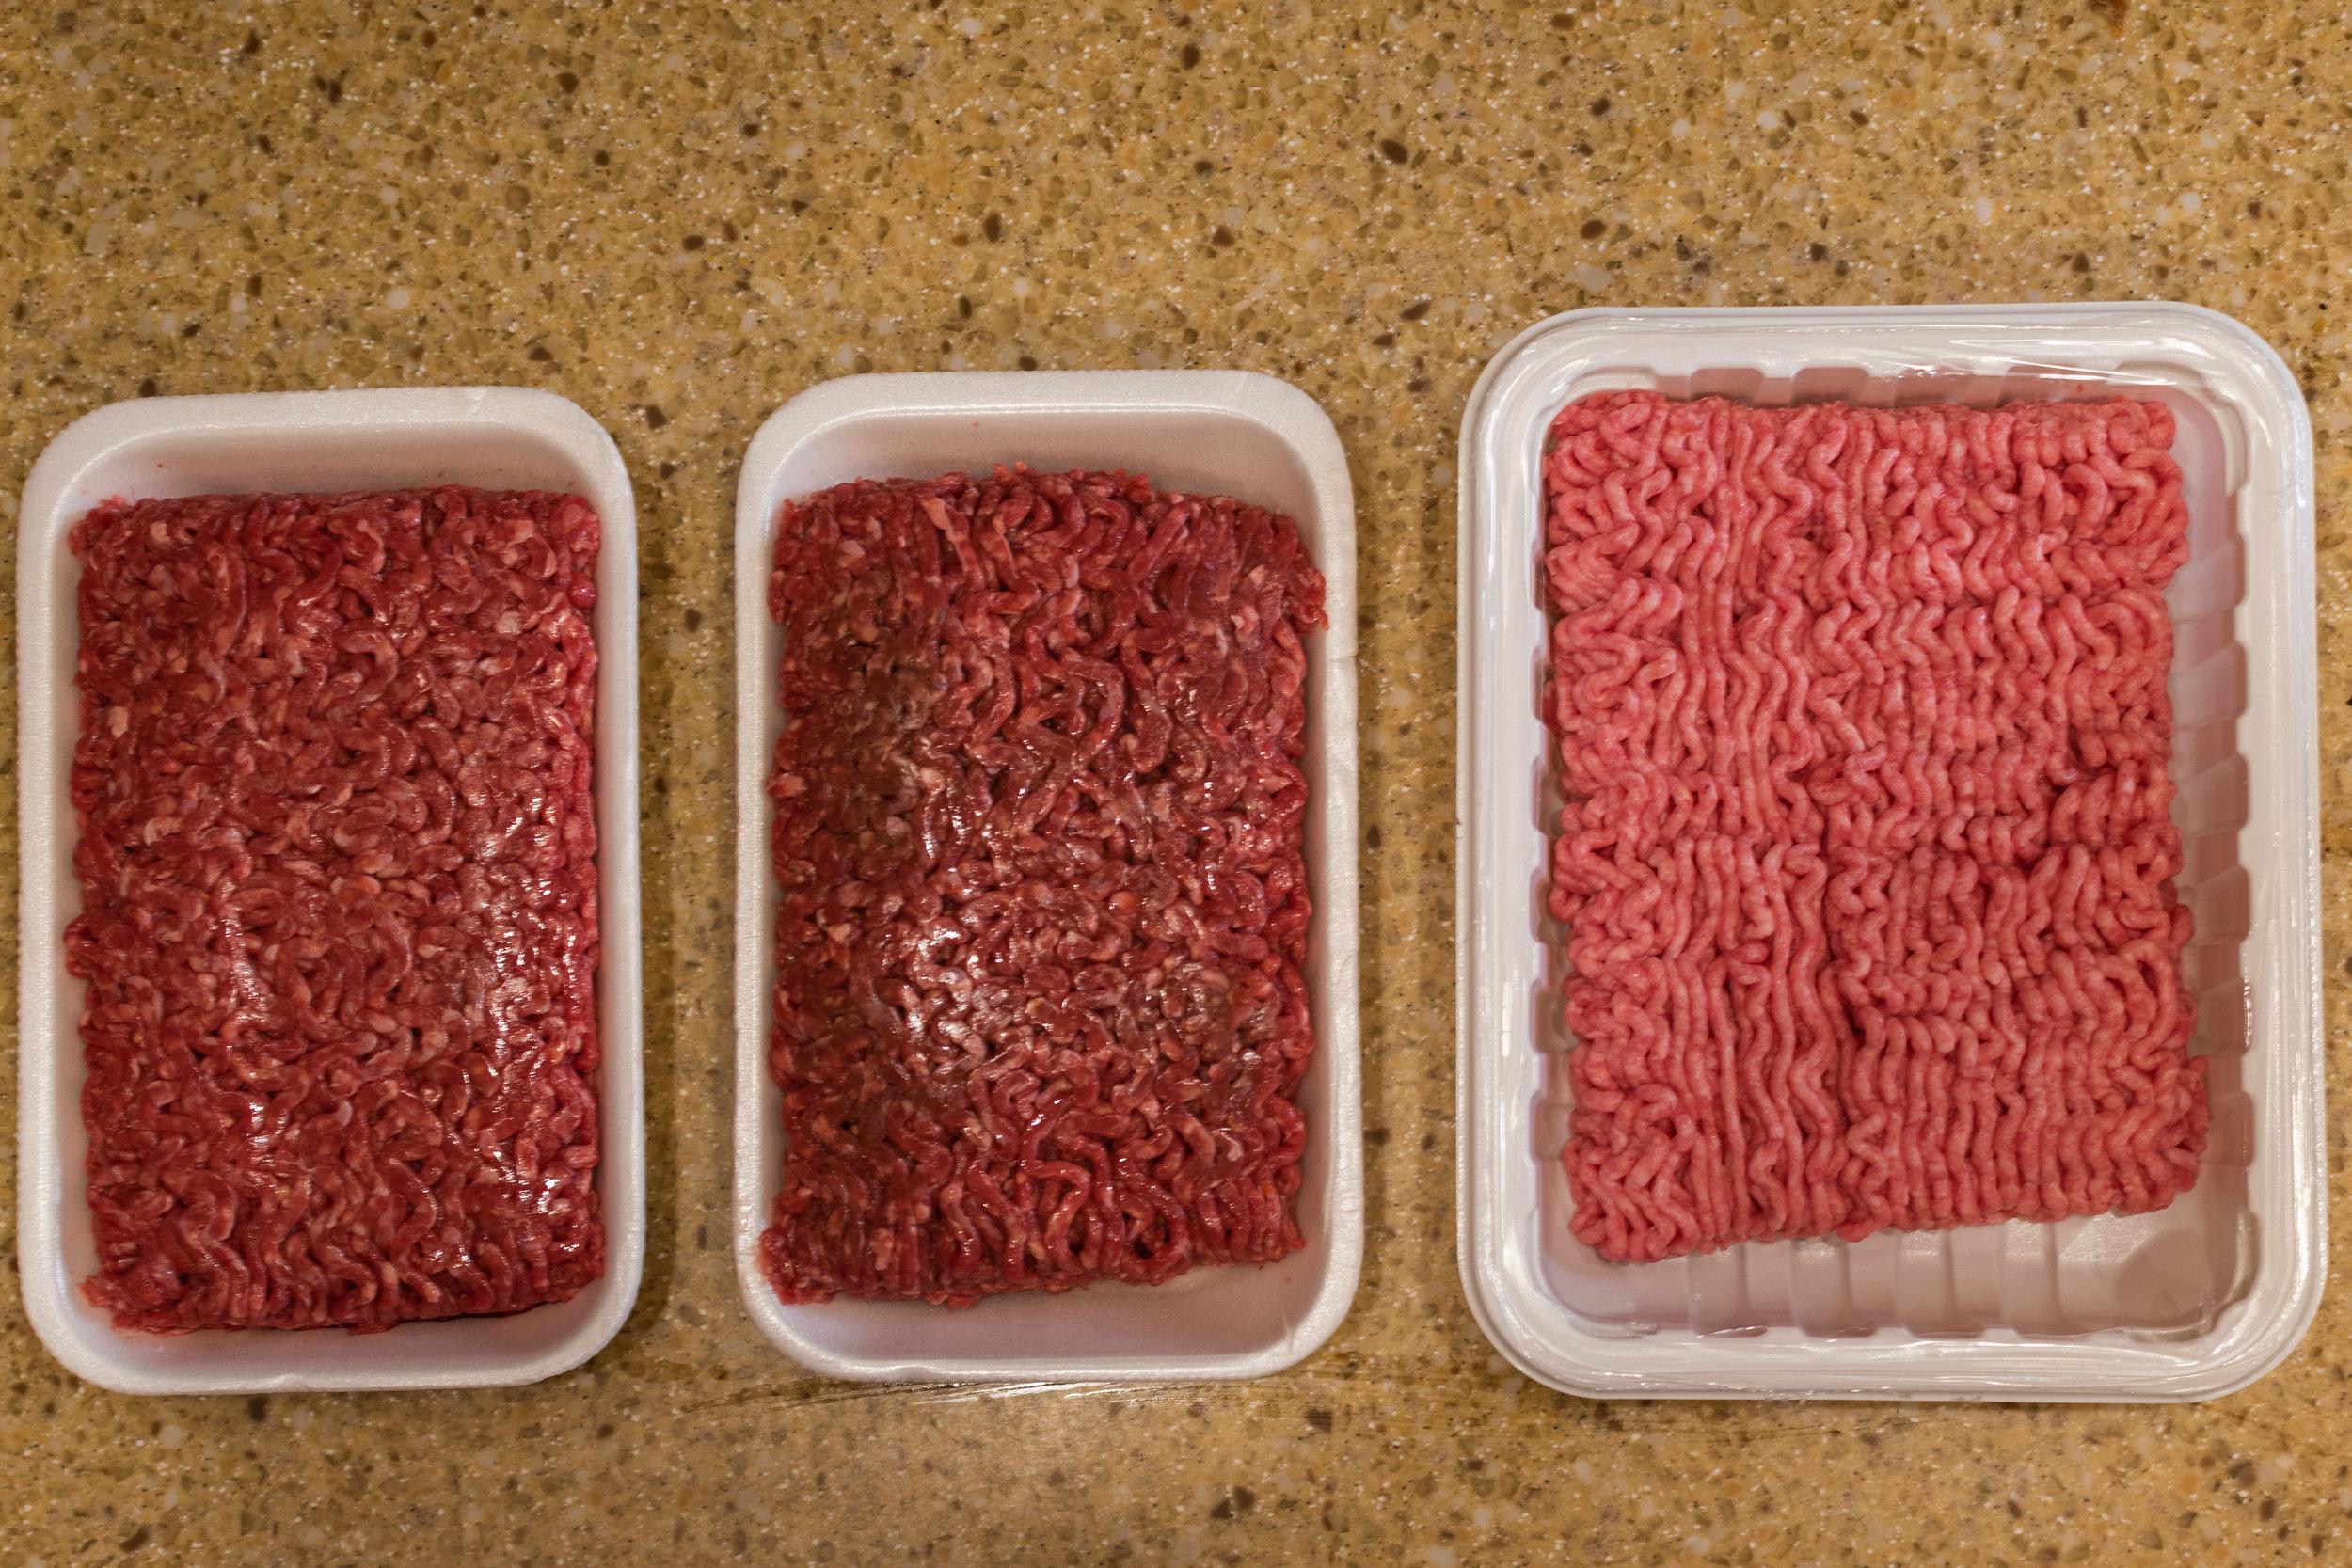 2:1 ratio of lean ground beef (90/10) to ground pork